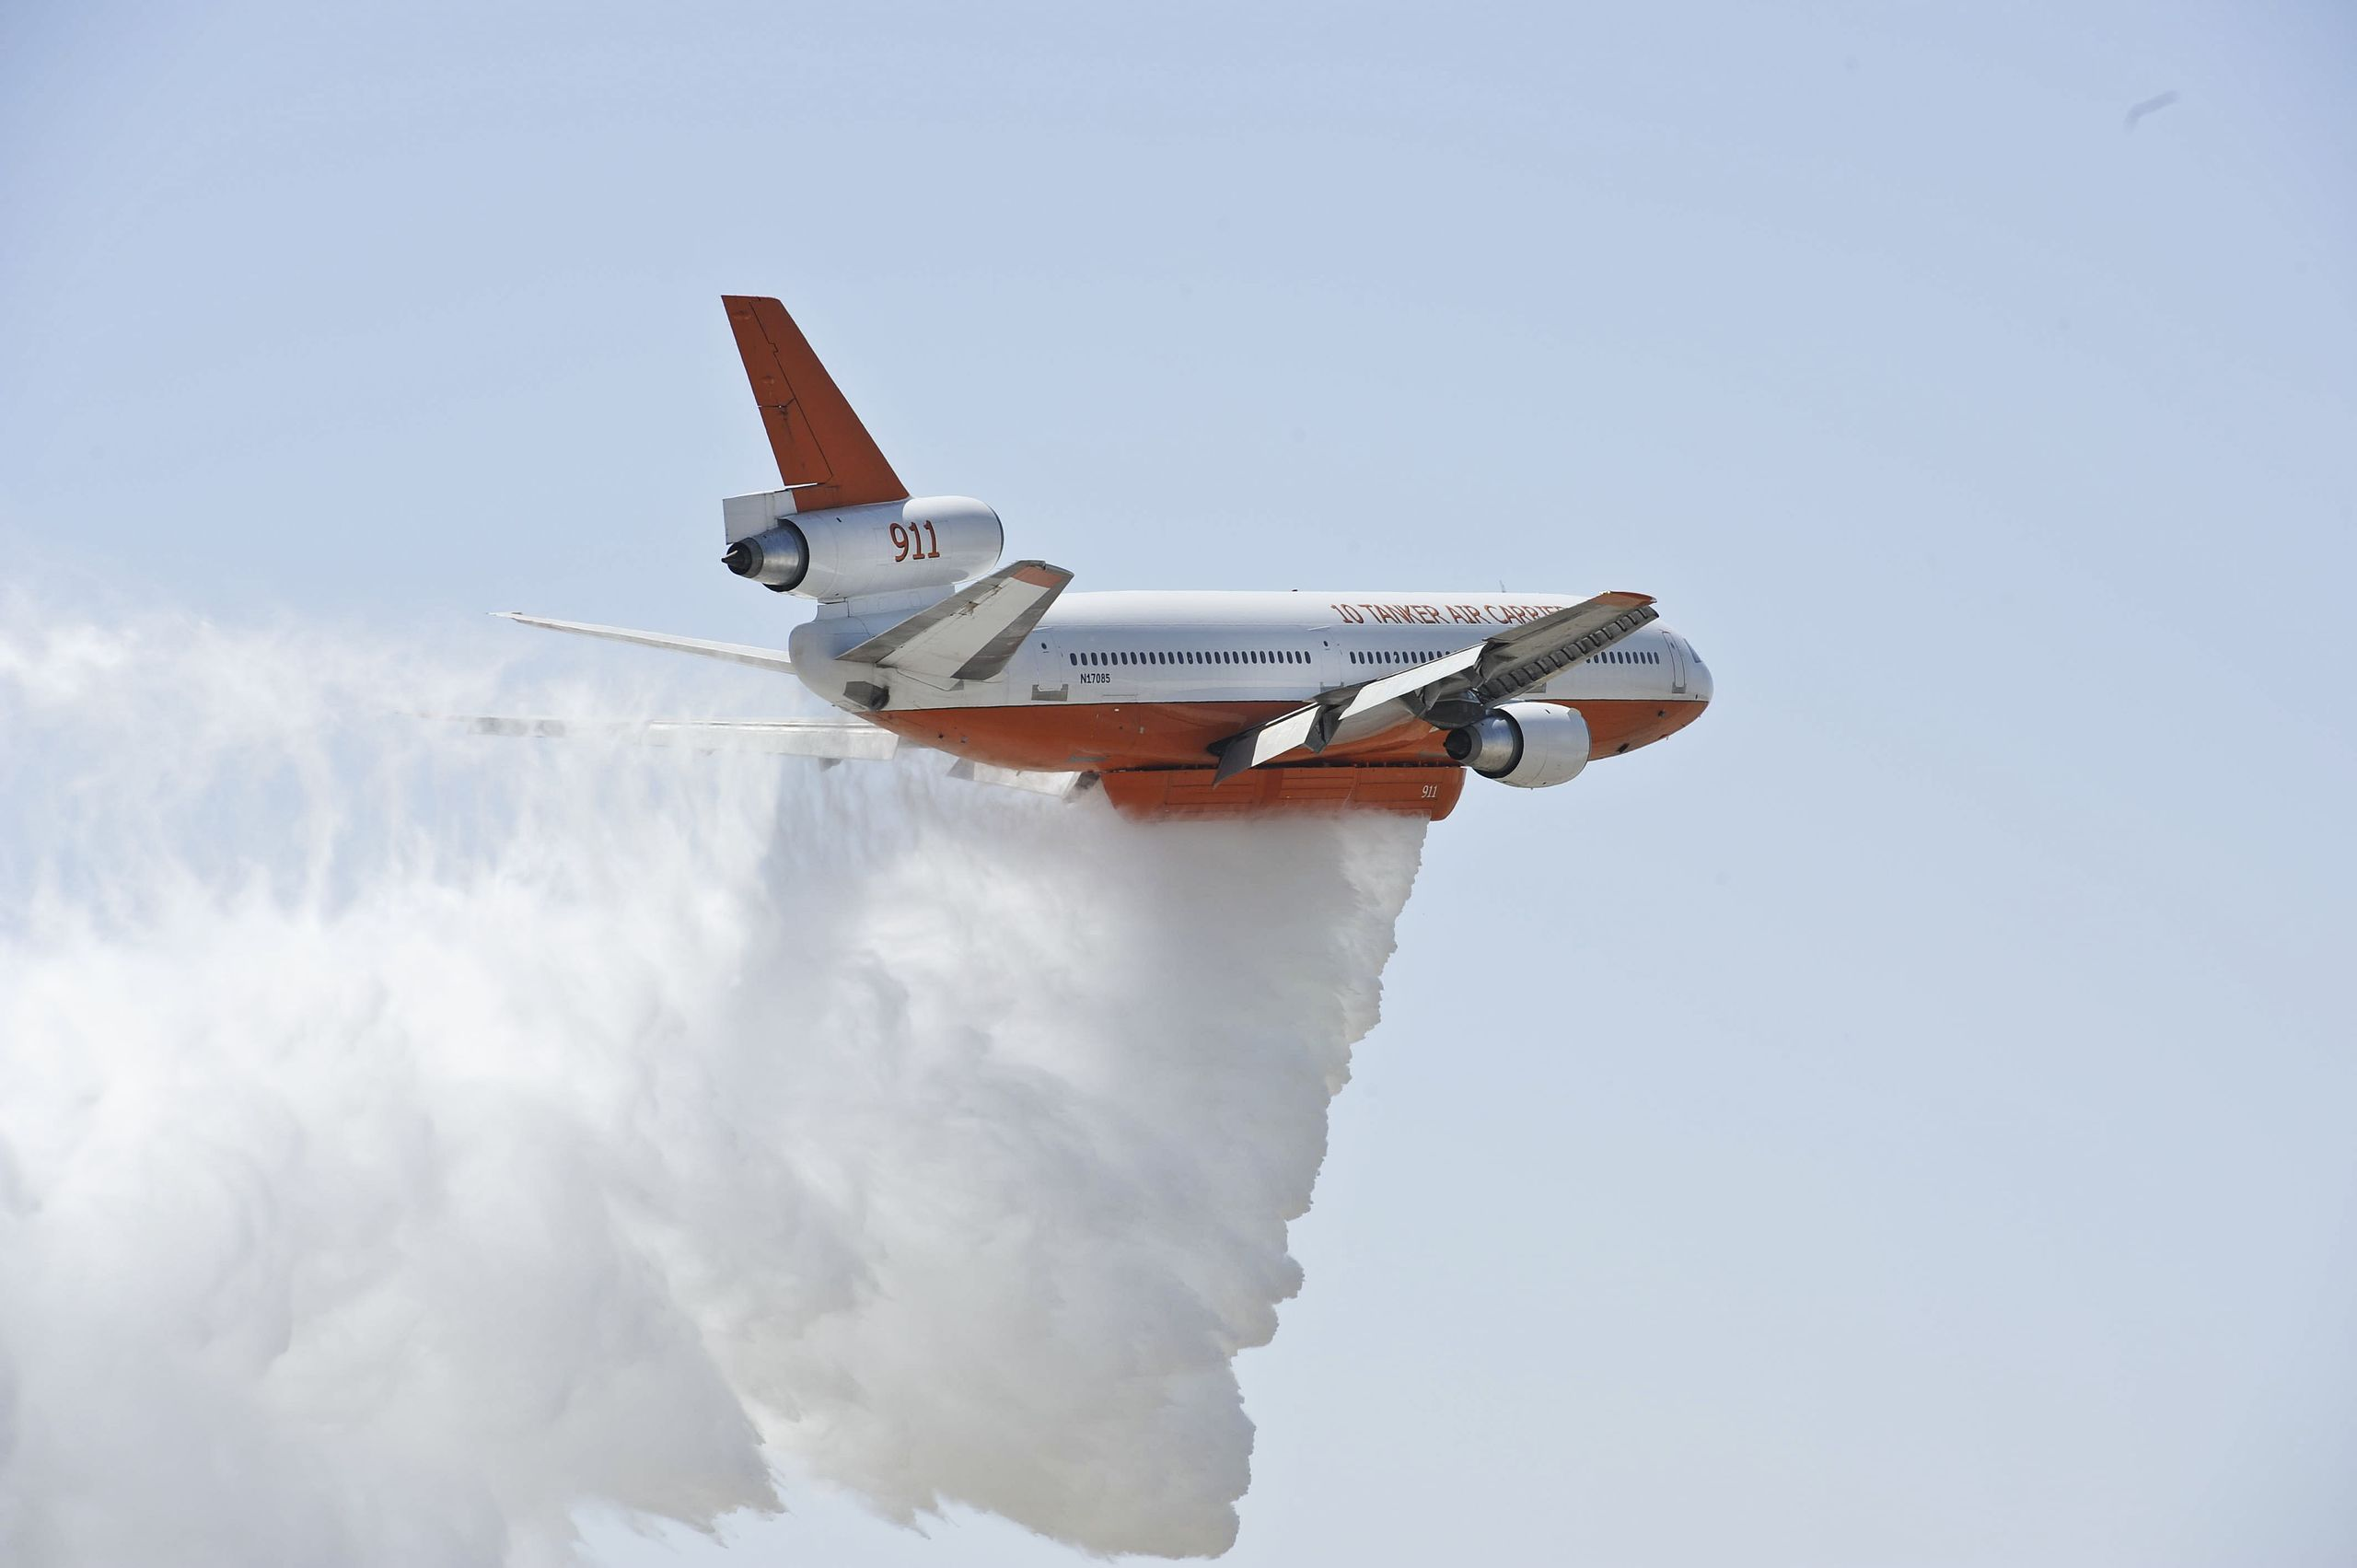 Thunder_Over_The_Empire_Airfest_2012_120519-F-EI671-001.jpg